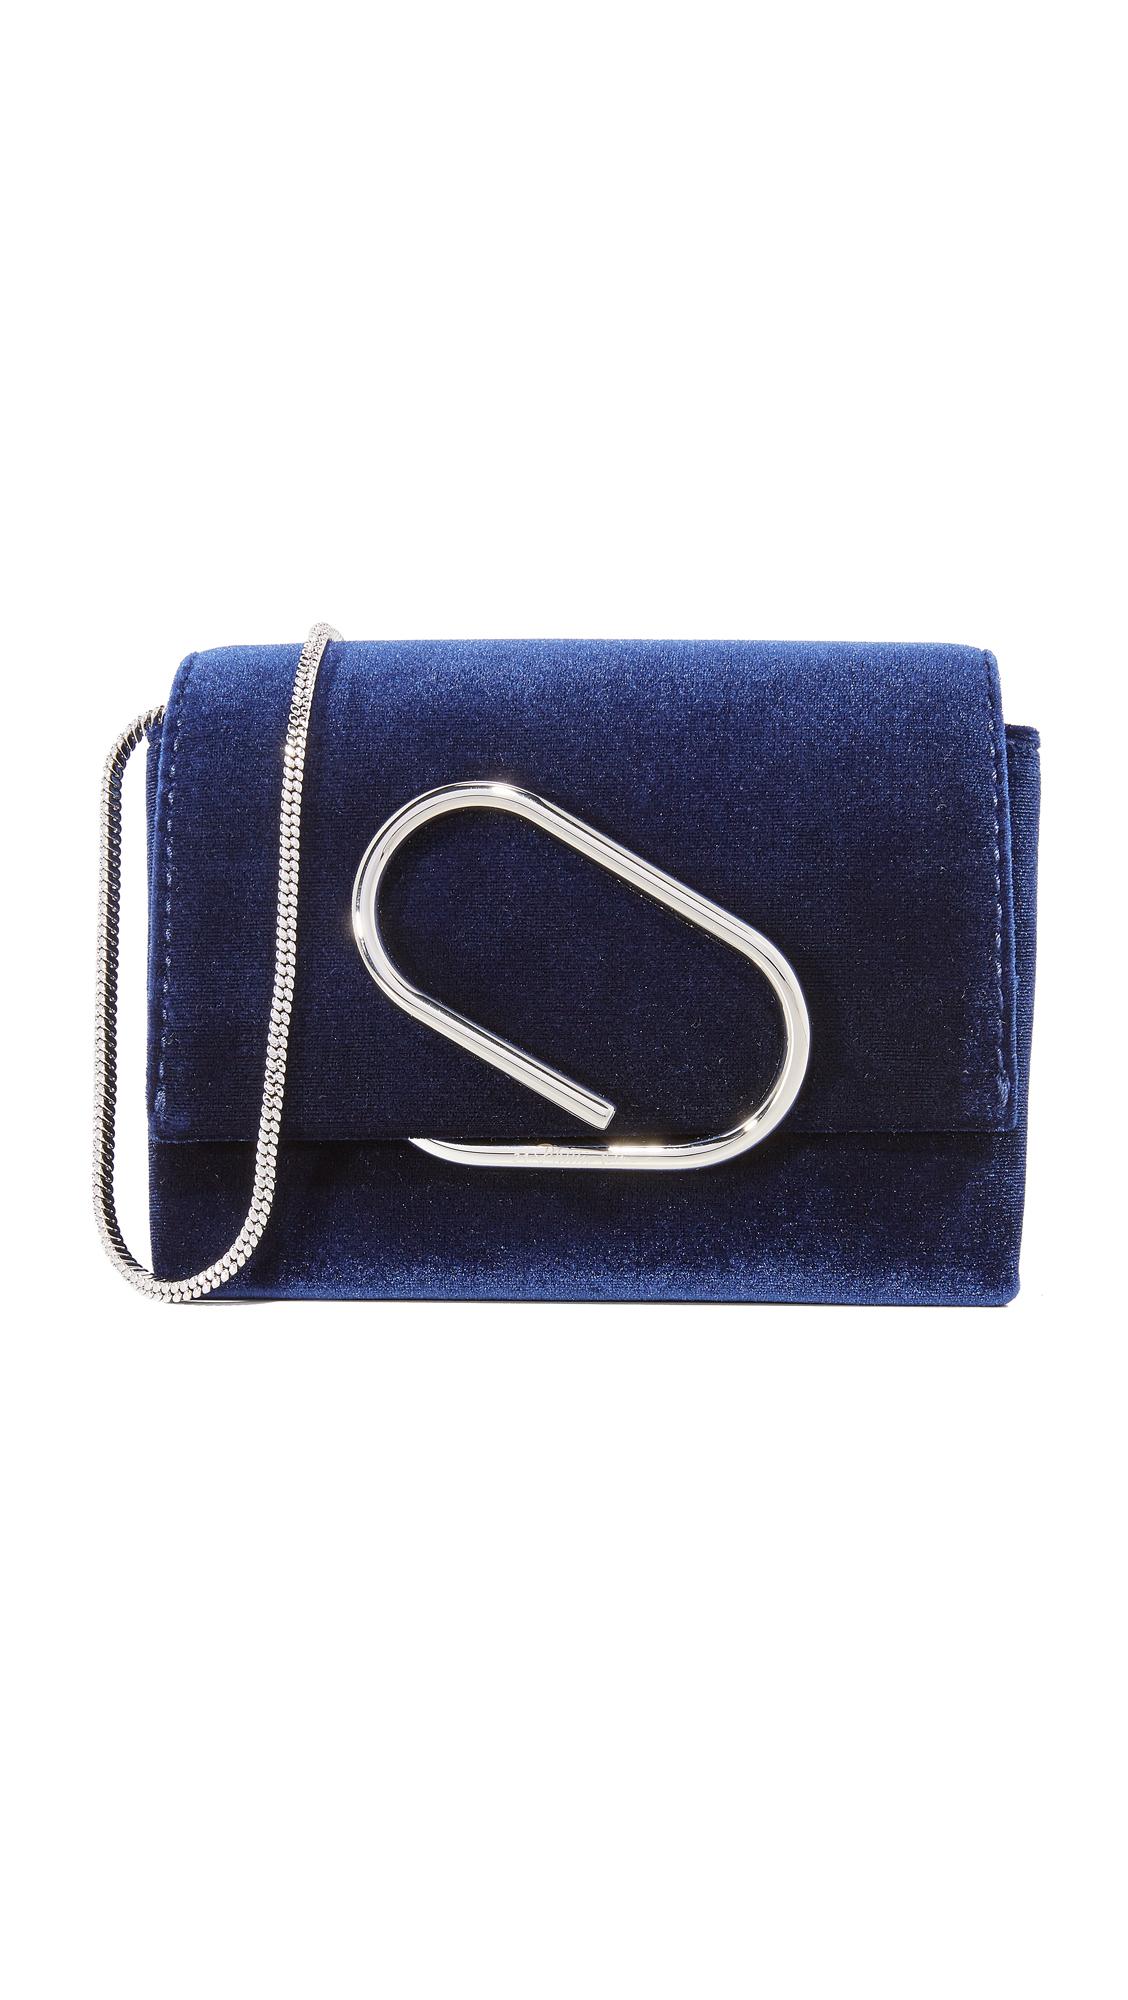 3.1 Phillip Lim Alix Micro Cross Body Bag - Royal Blue